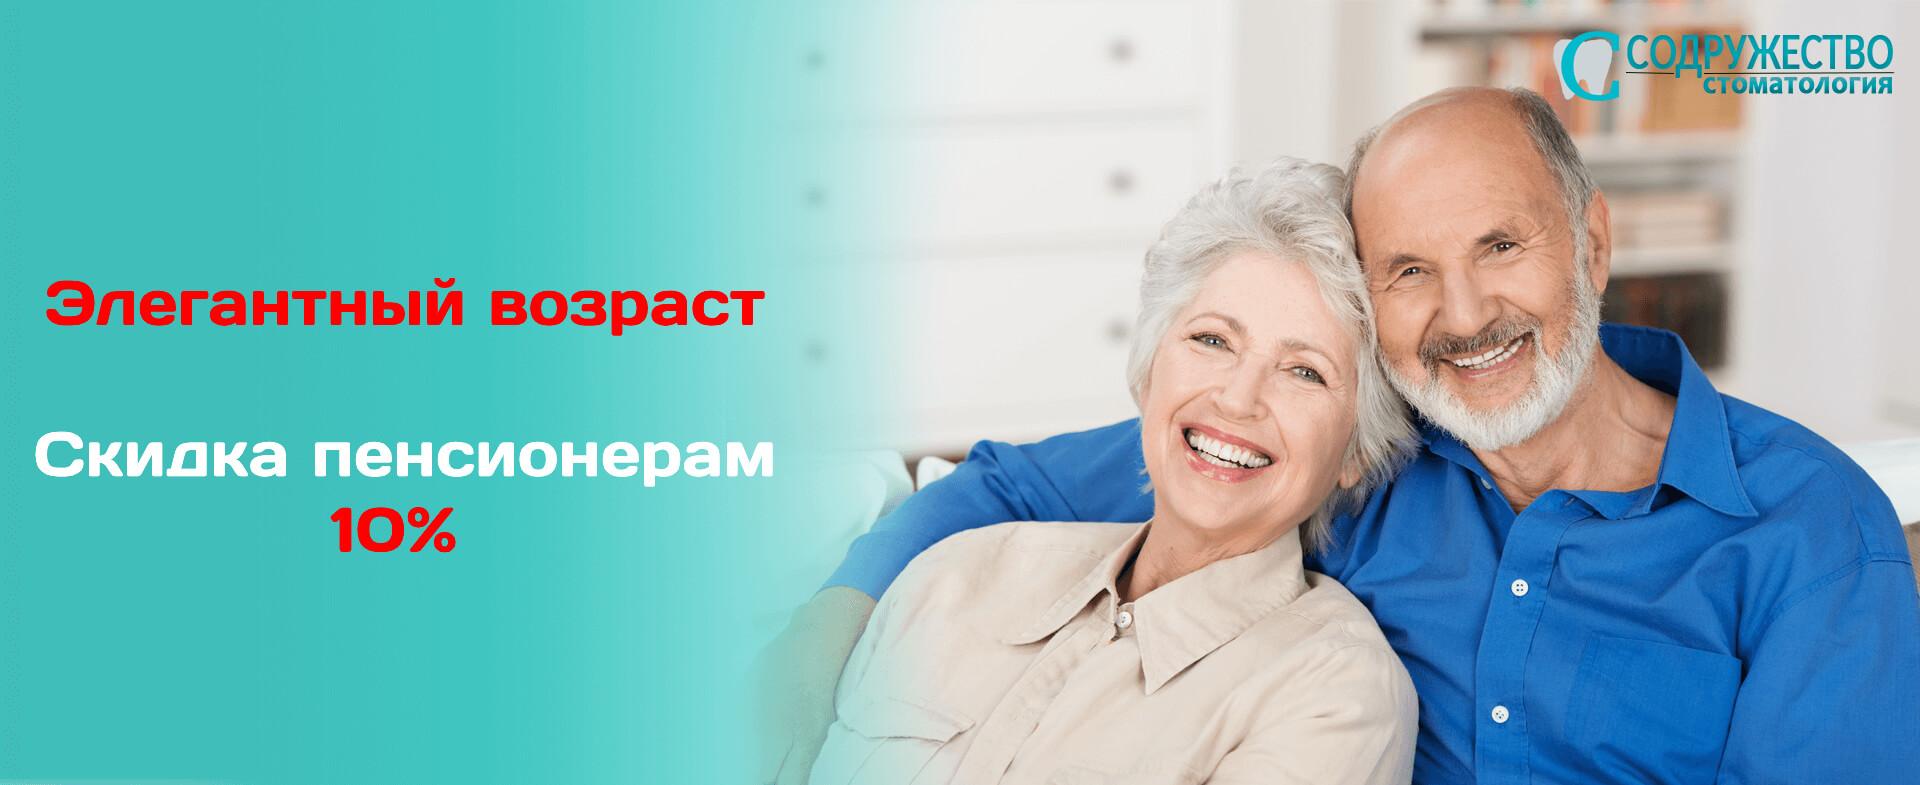 Скидки пенсионерам в статмологии на лечение зубов